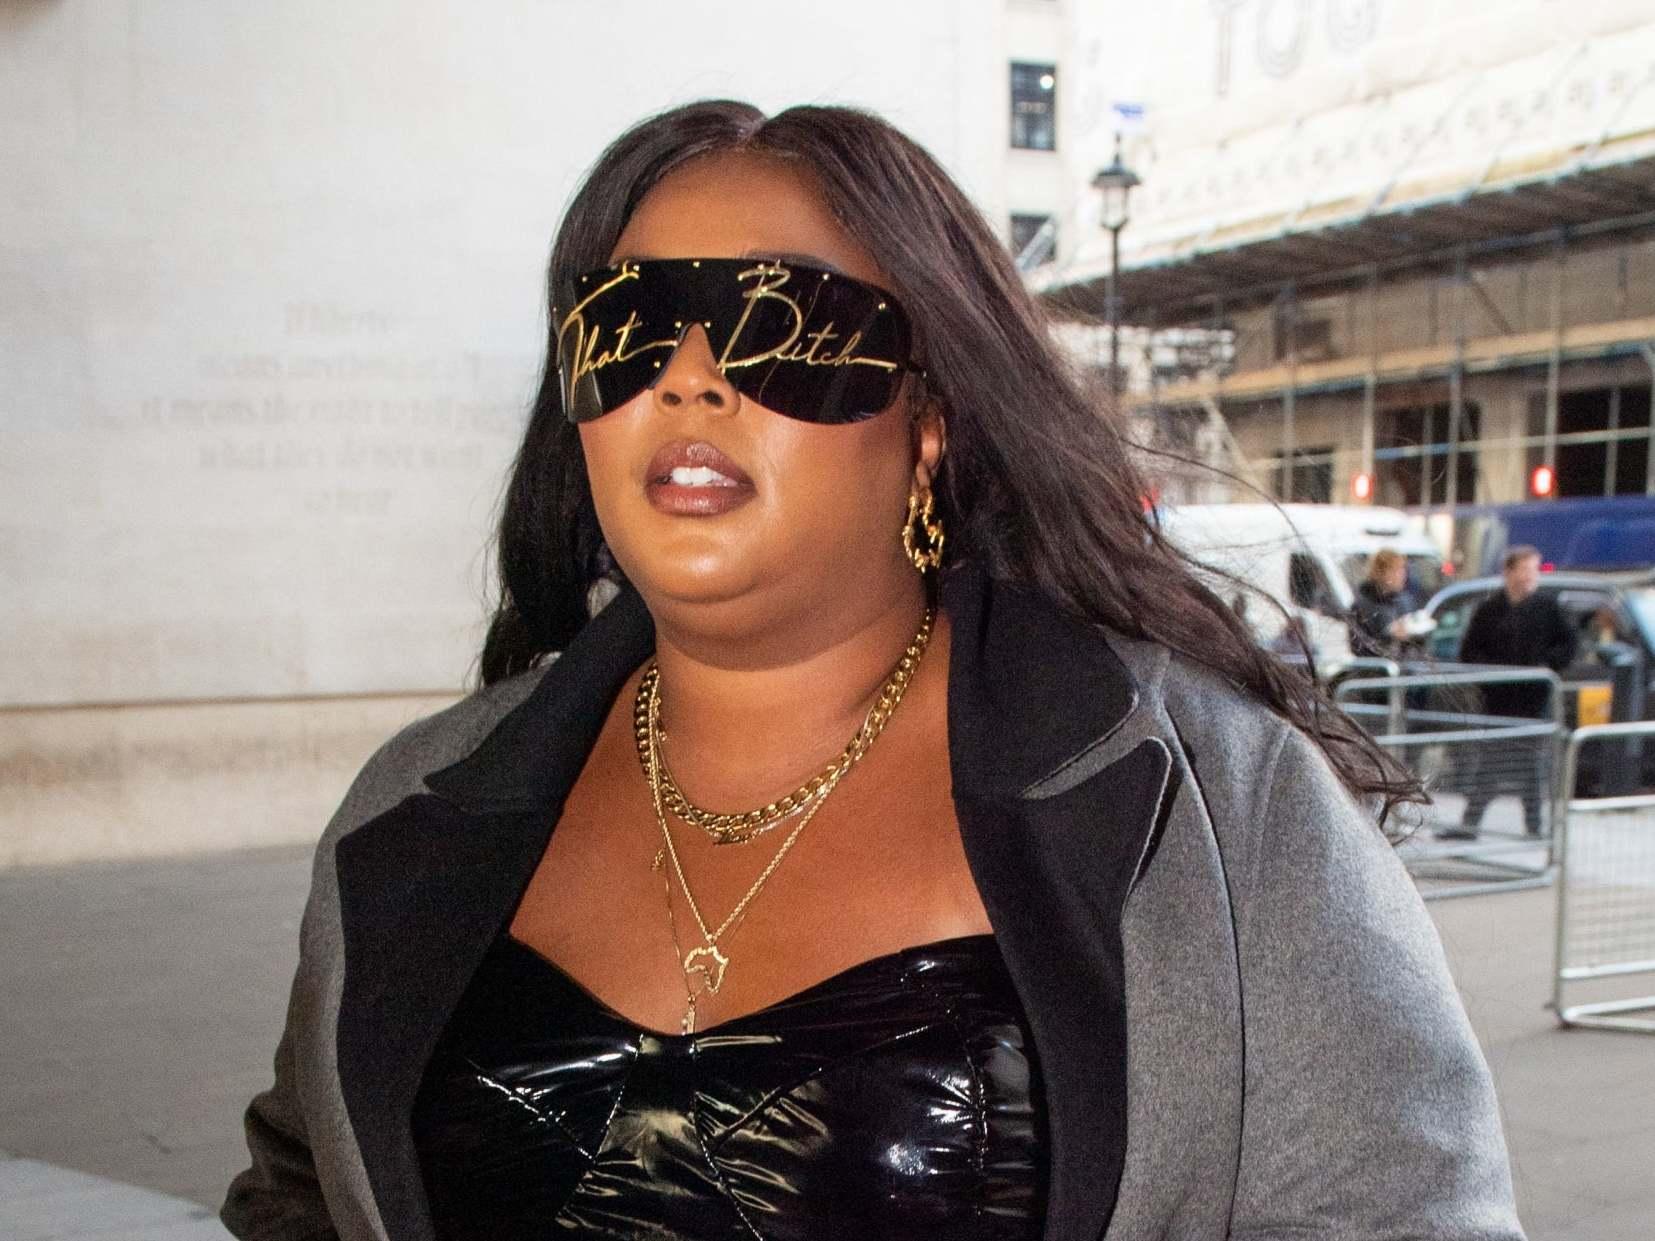 Lizzo wears 'That Bitch' sunglasses ahead of BBC Radio 1 Live Lounge performance